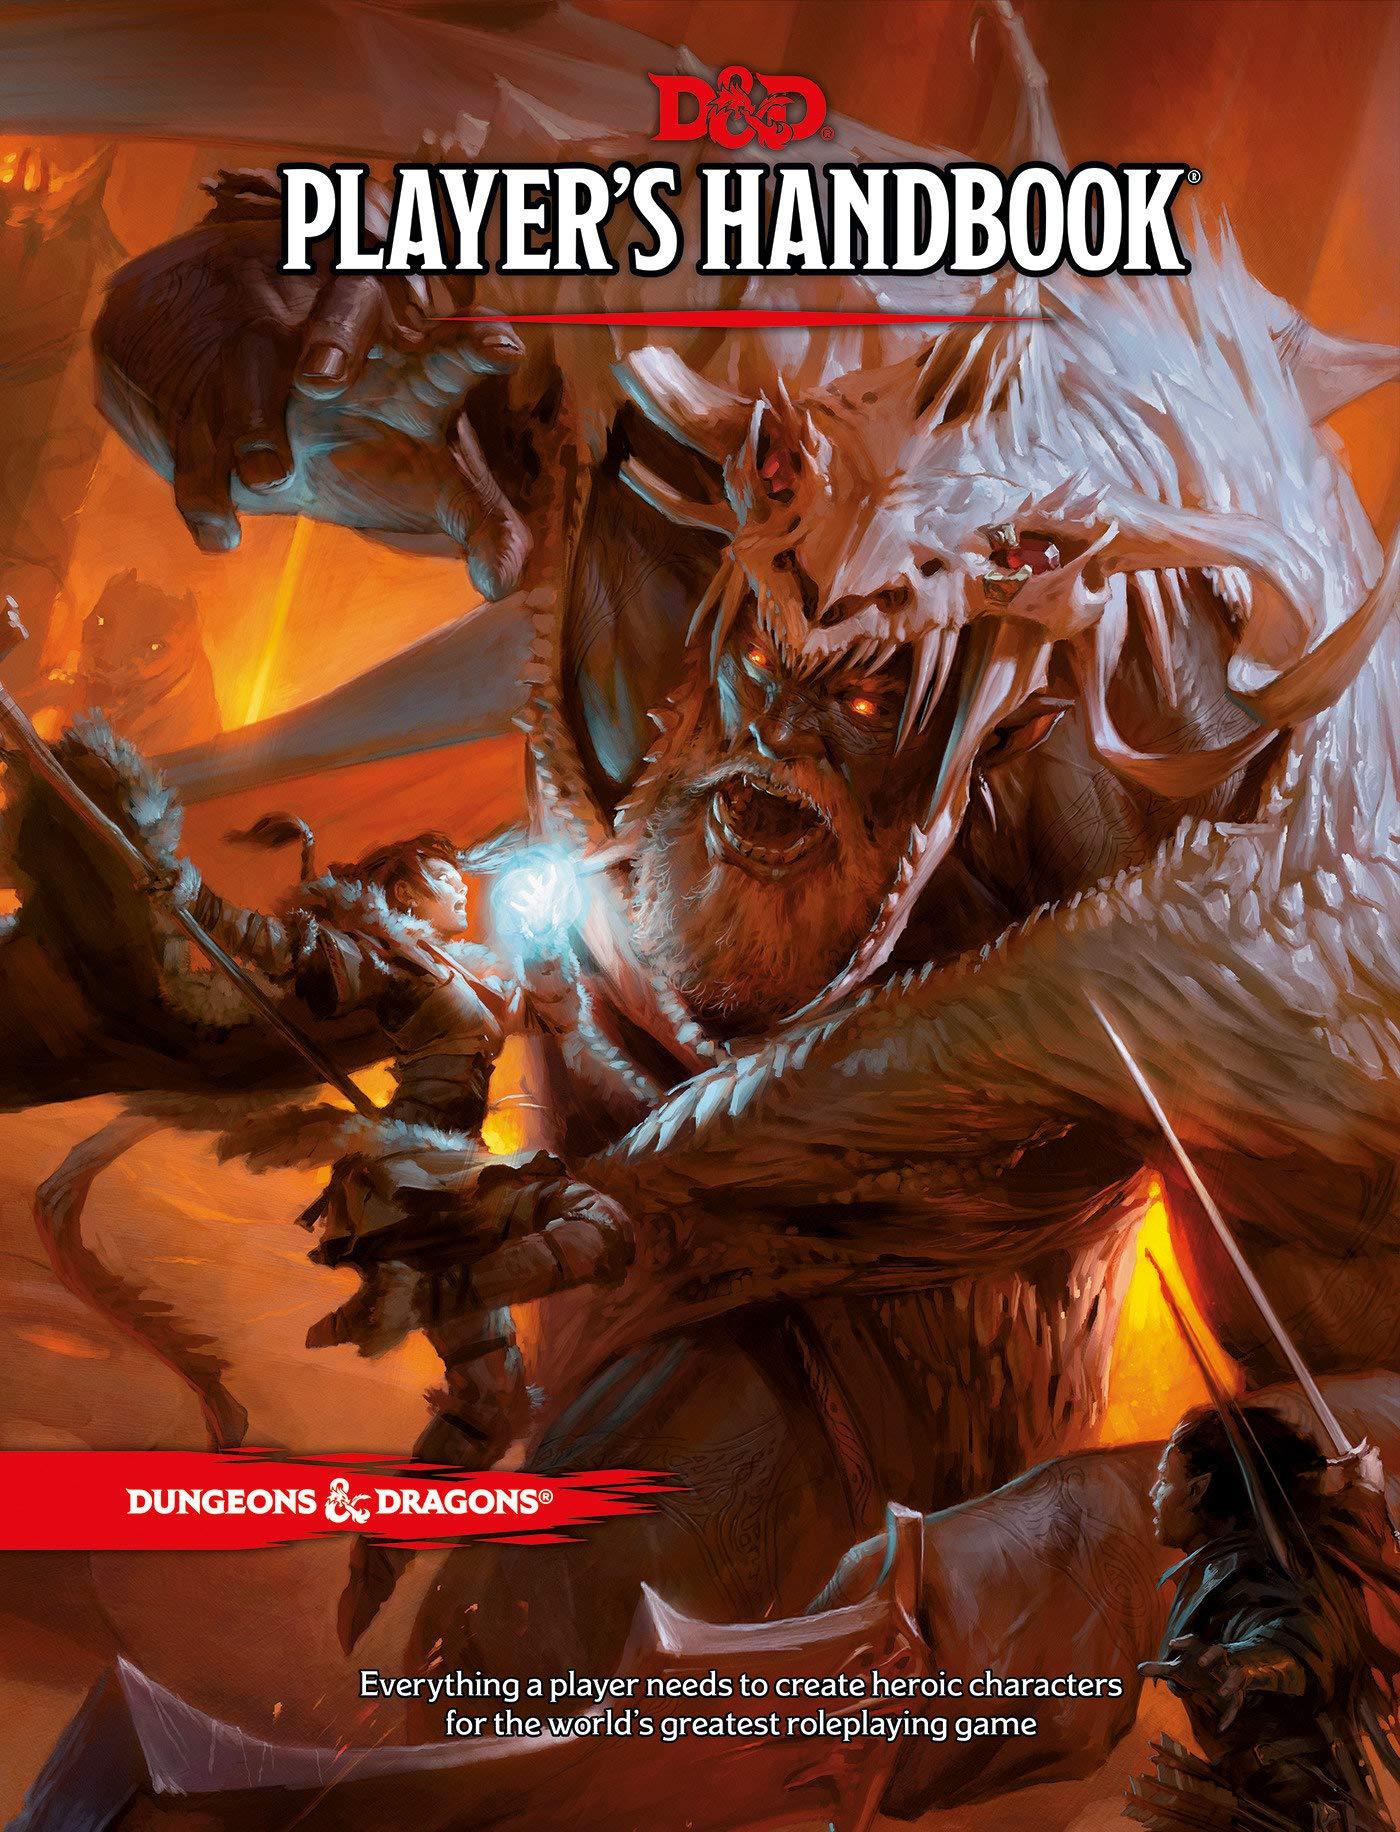 Dnd 5e Players handbook pdf free